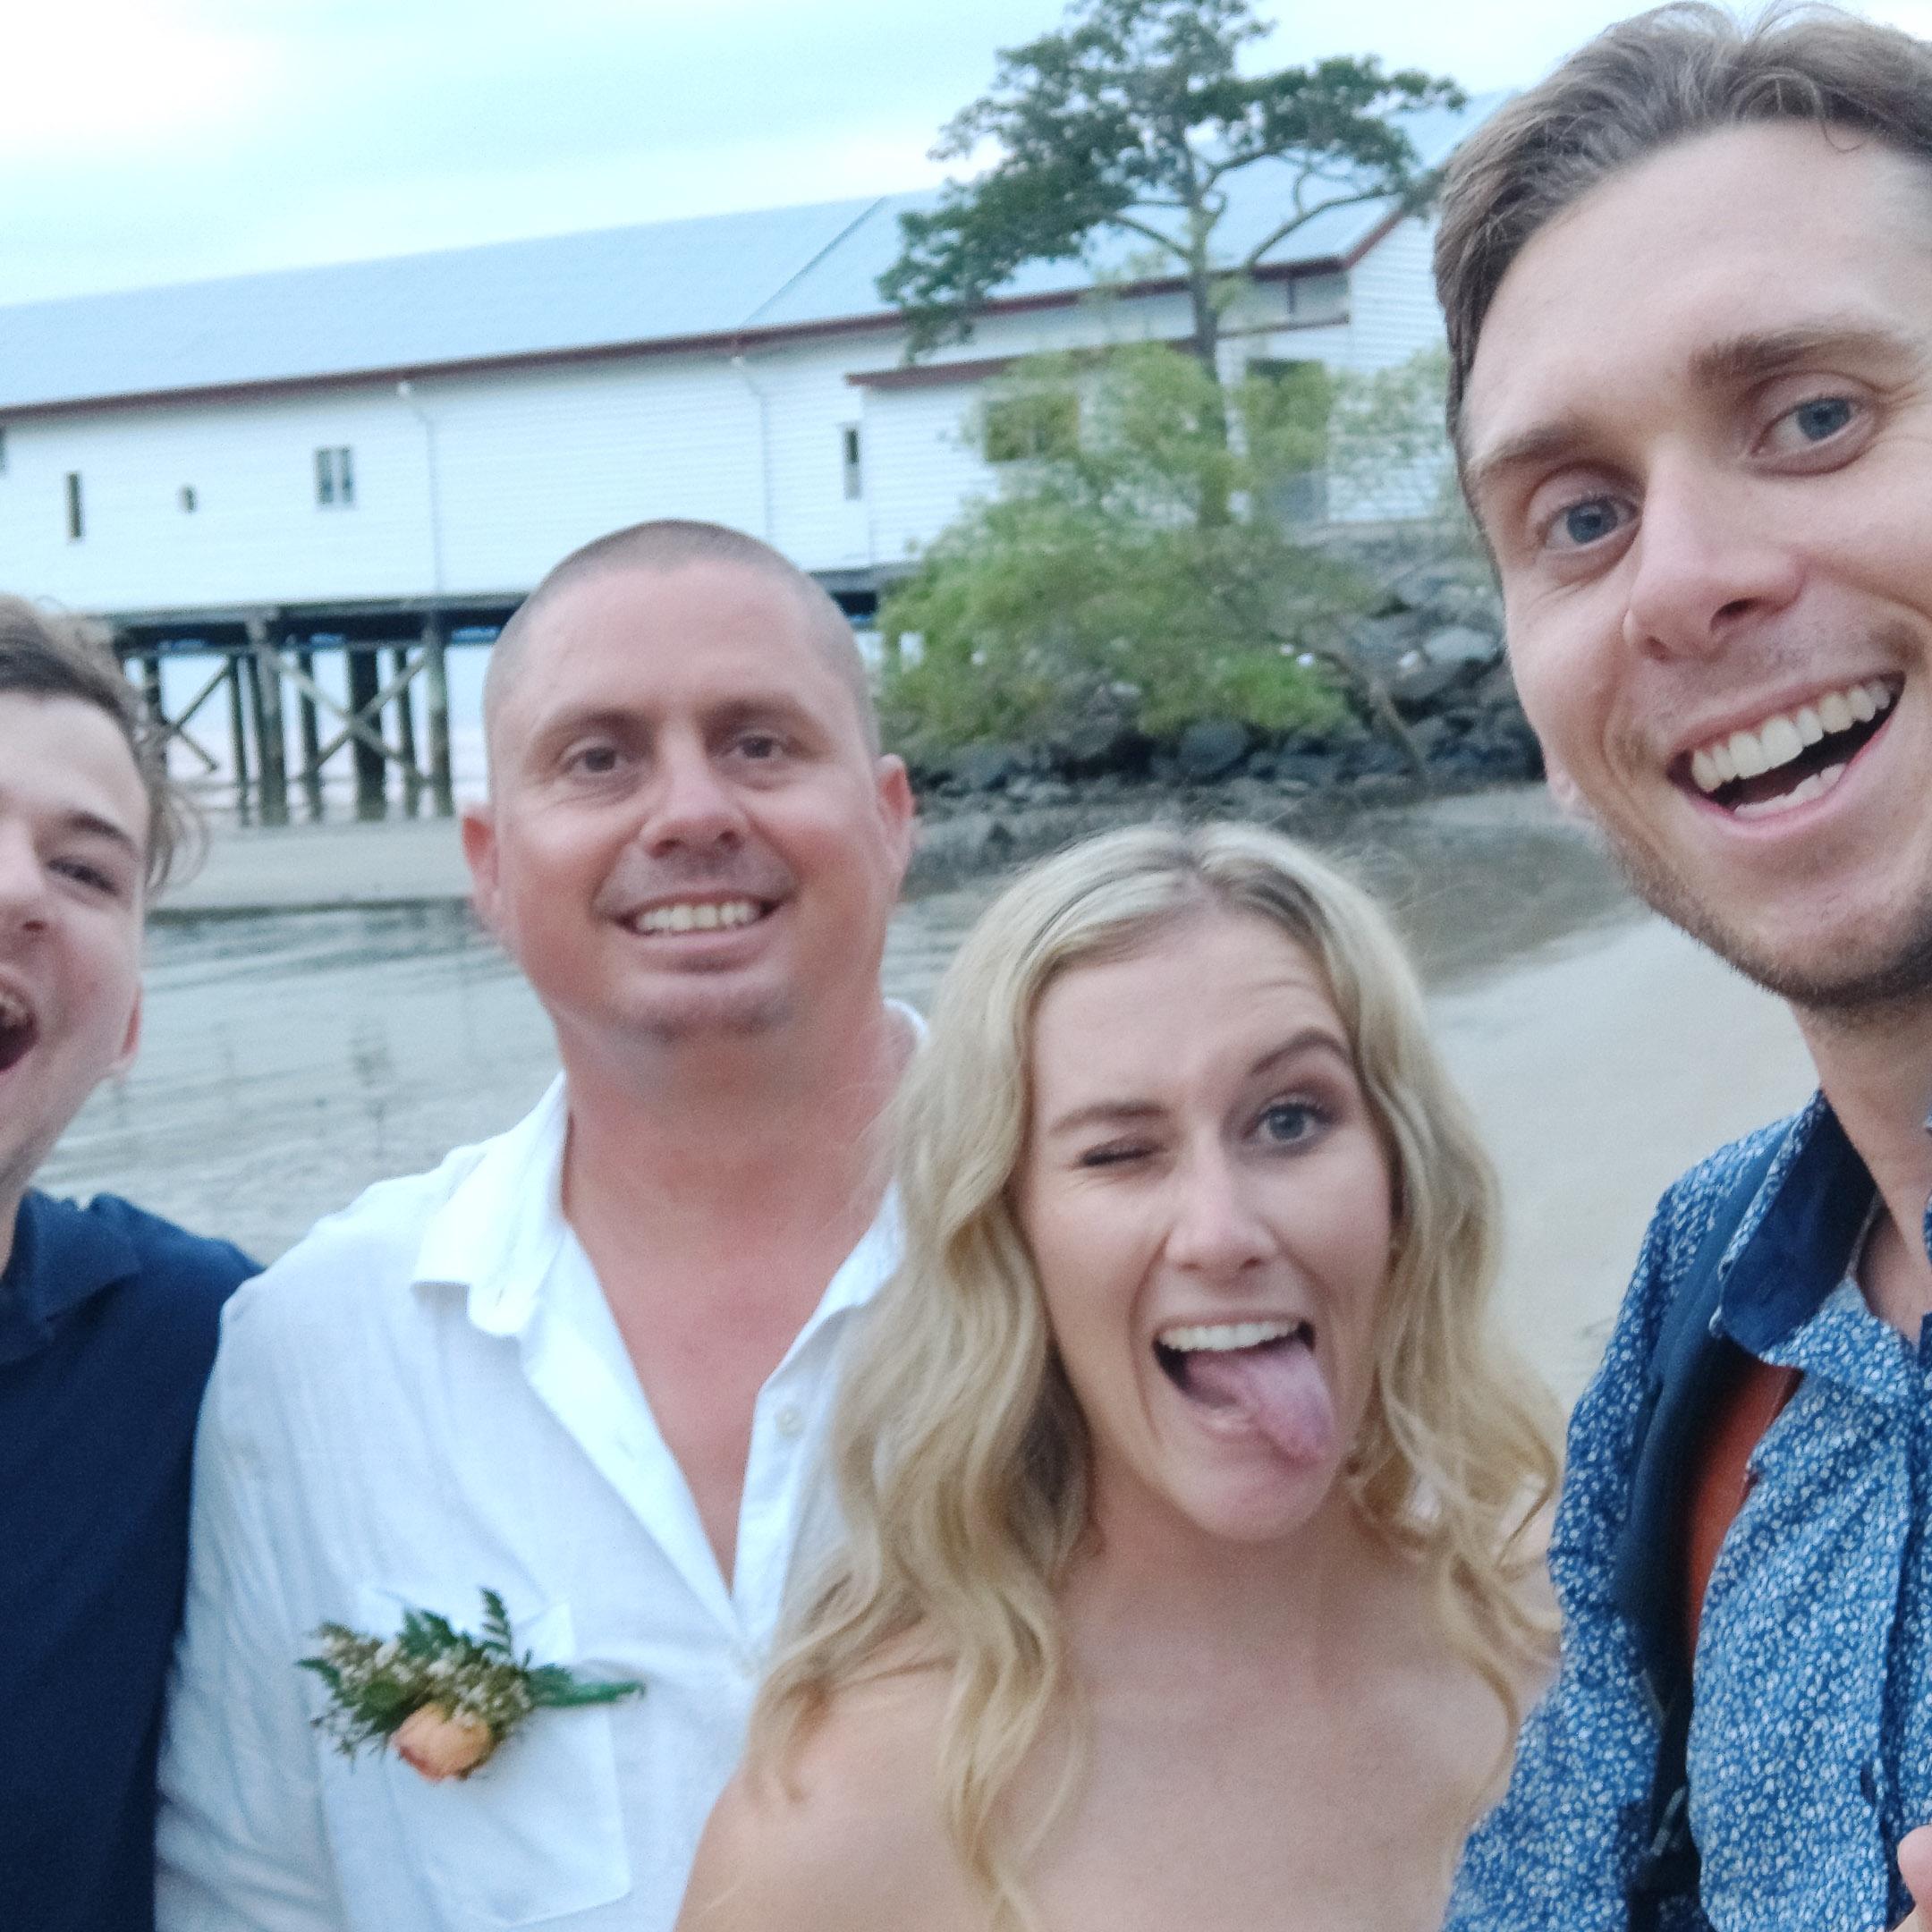 The-raw-photographer-cairns-wedding-photography-bridalparty-selfie-4.jpg